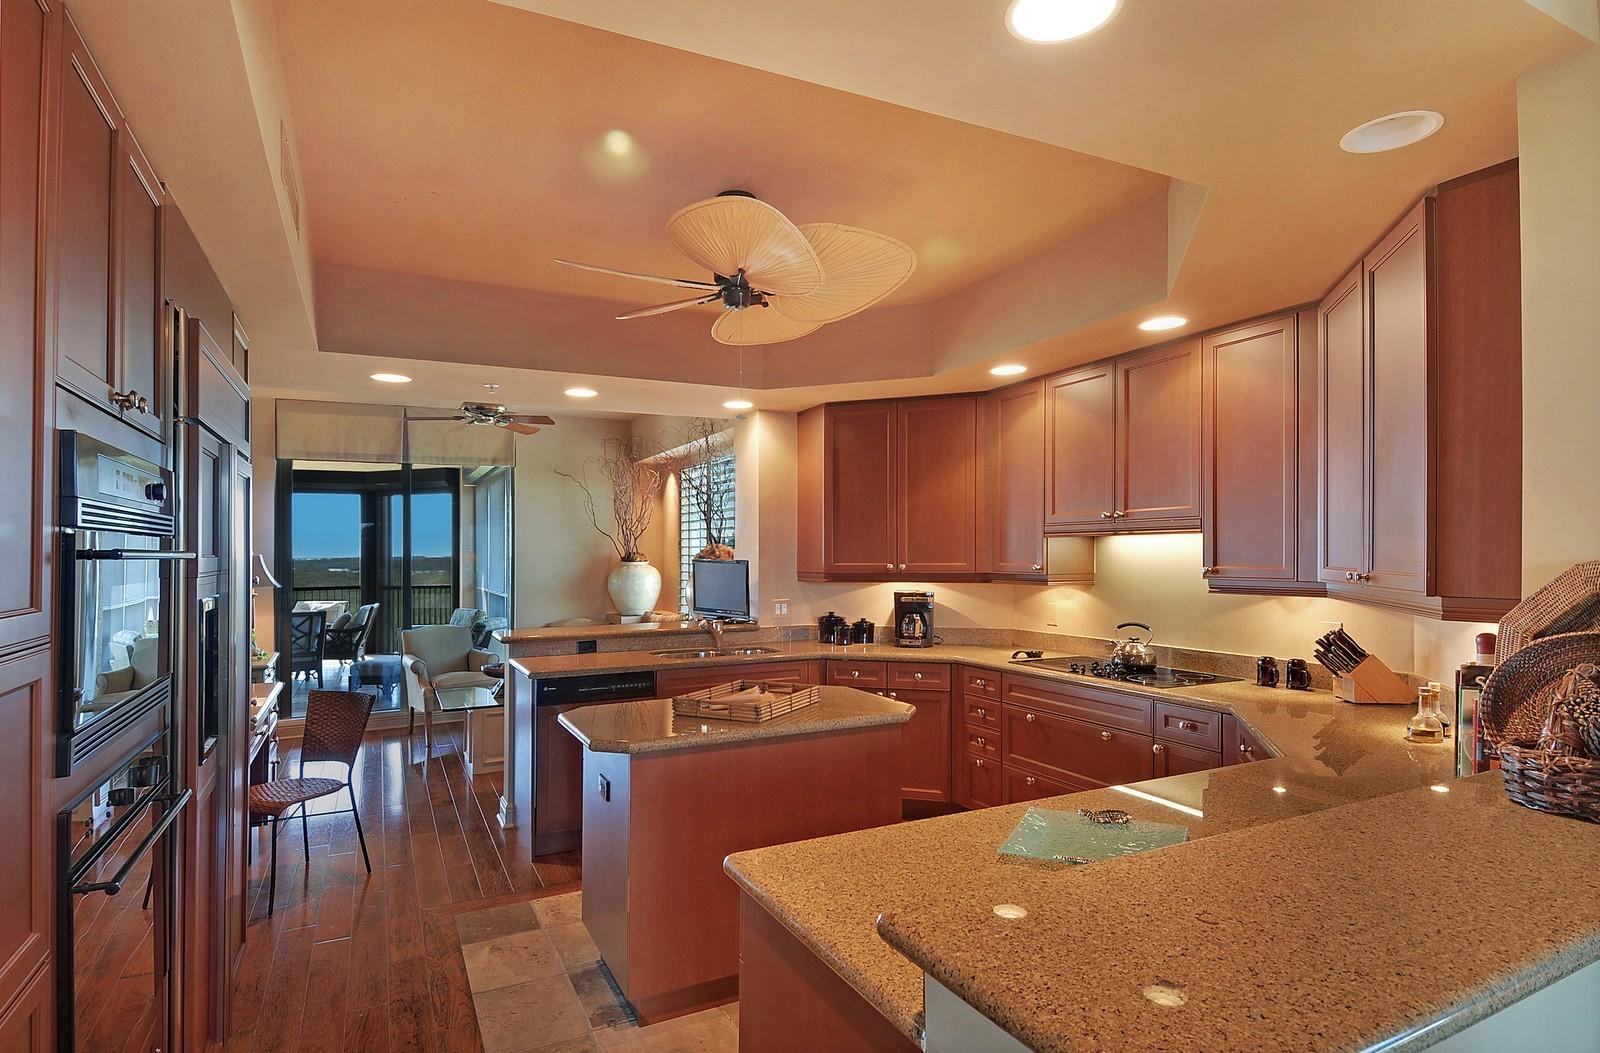 Real Estate Photography - 4875 Pelican Colony Blvd, Unit 304, Bonita Springs, FL, 34134 - Kitchen